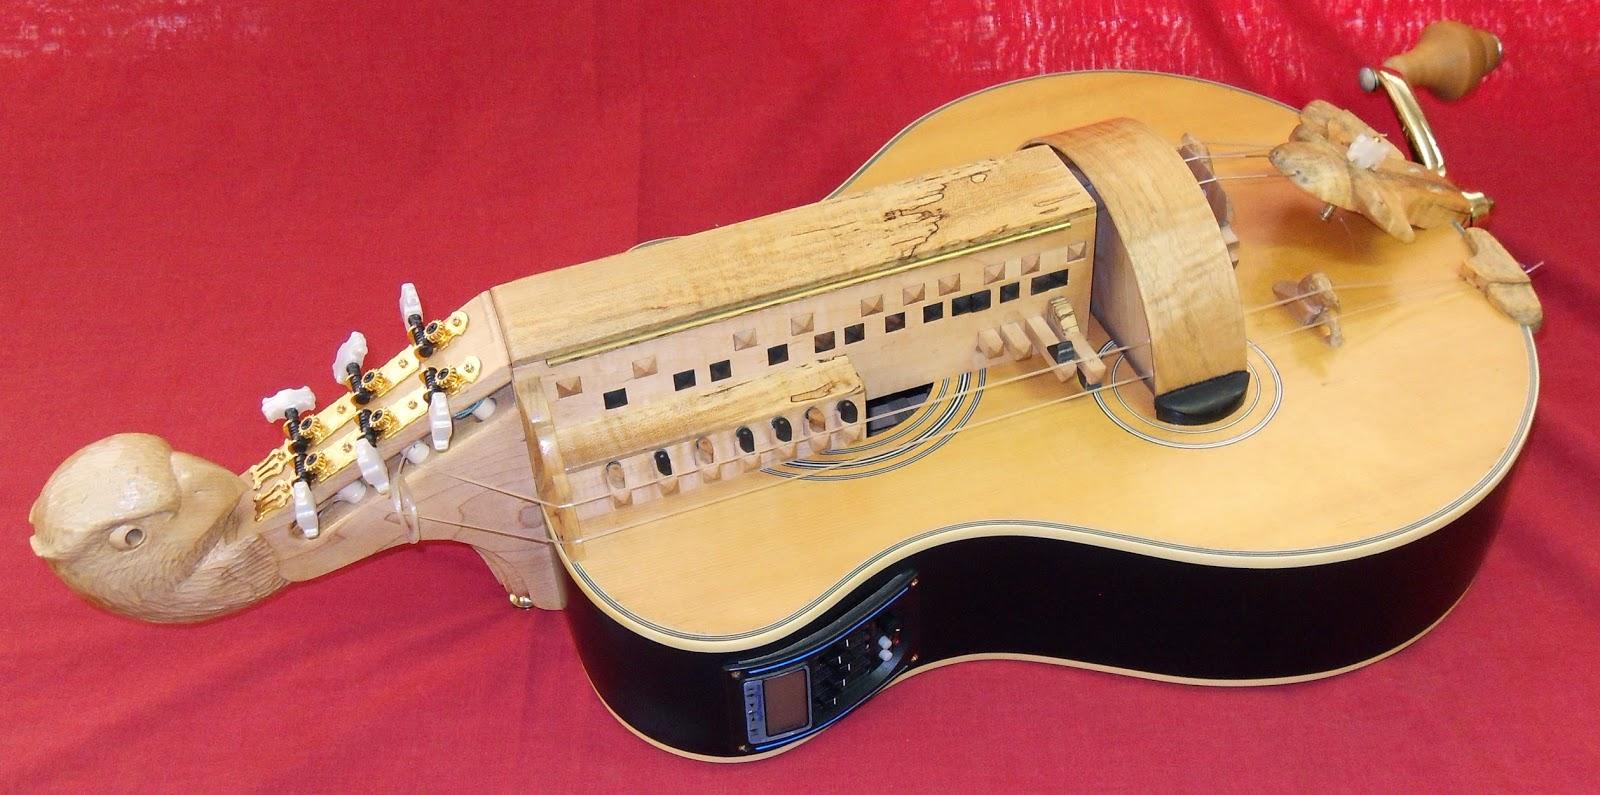 joel peyton luthier my hurdy gurdy. Black Bedroom Furniture Sets. Home Design Ideas